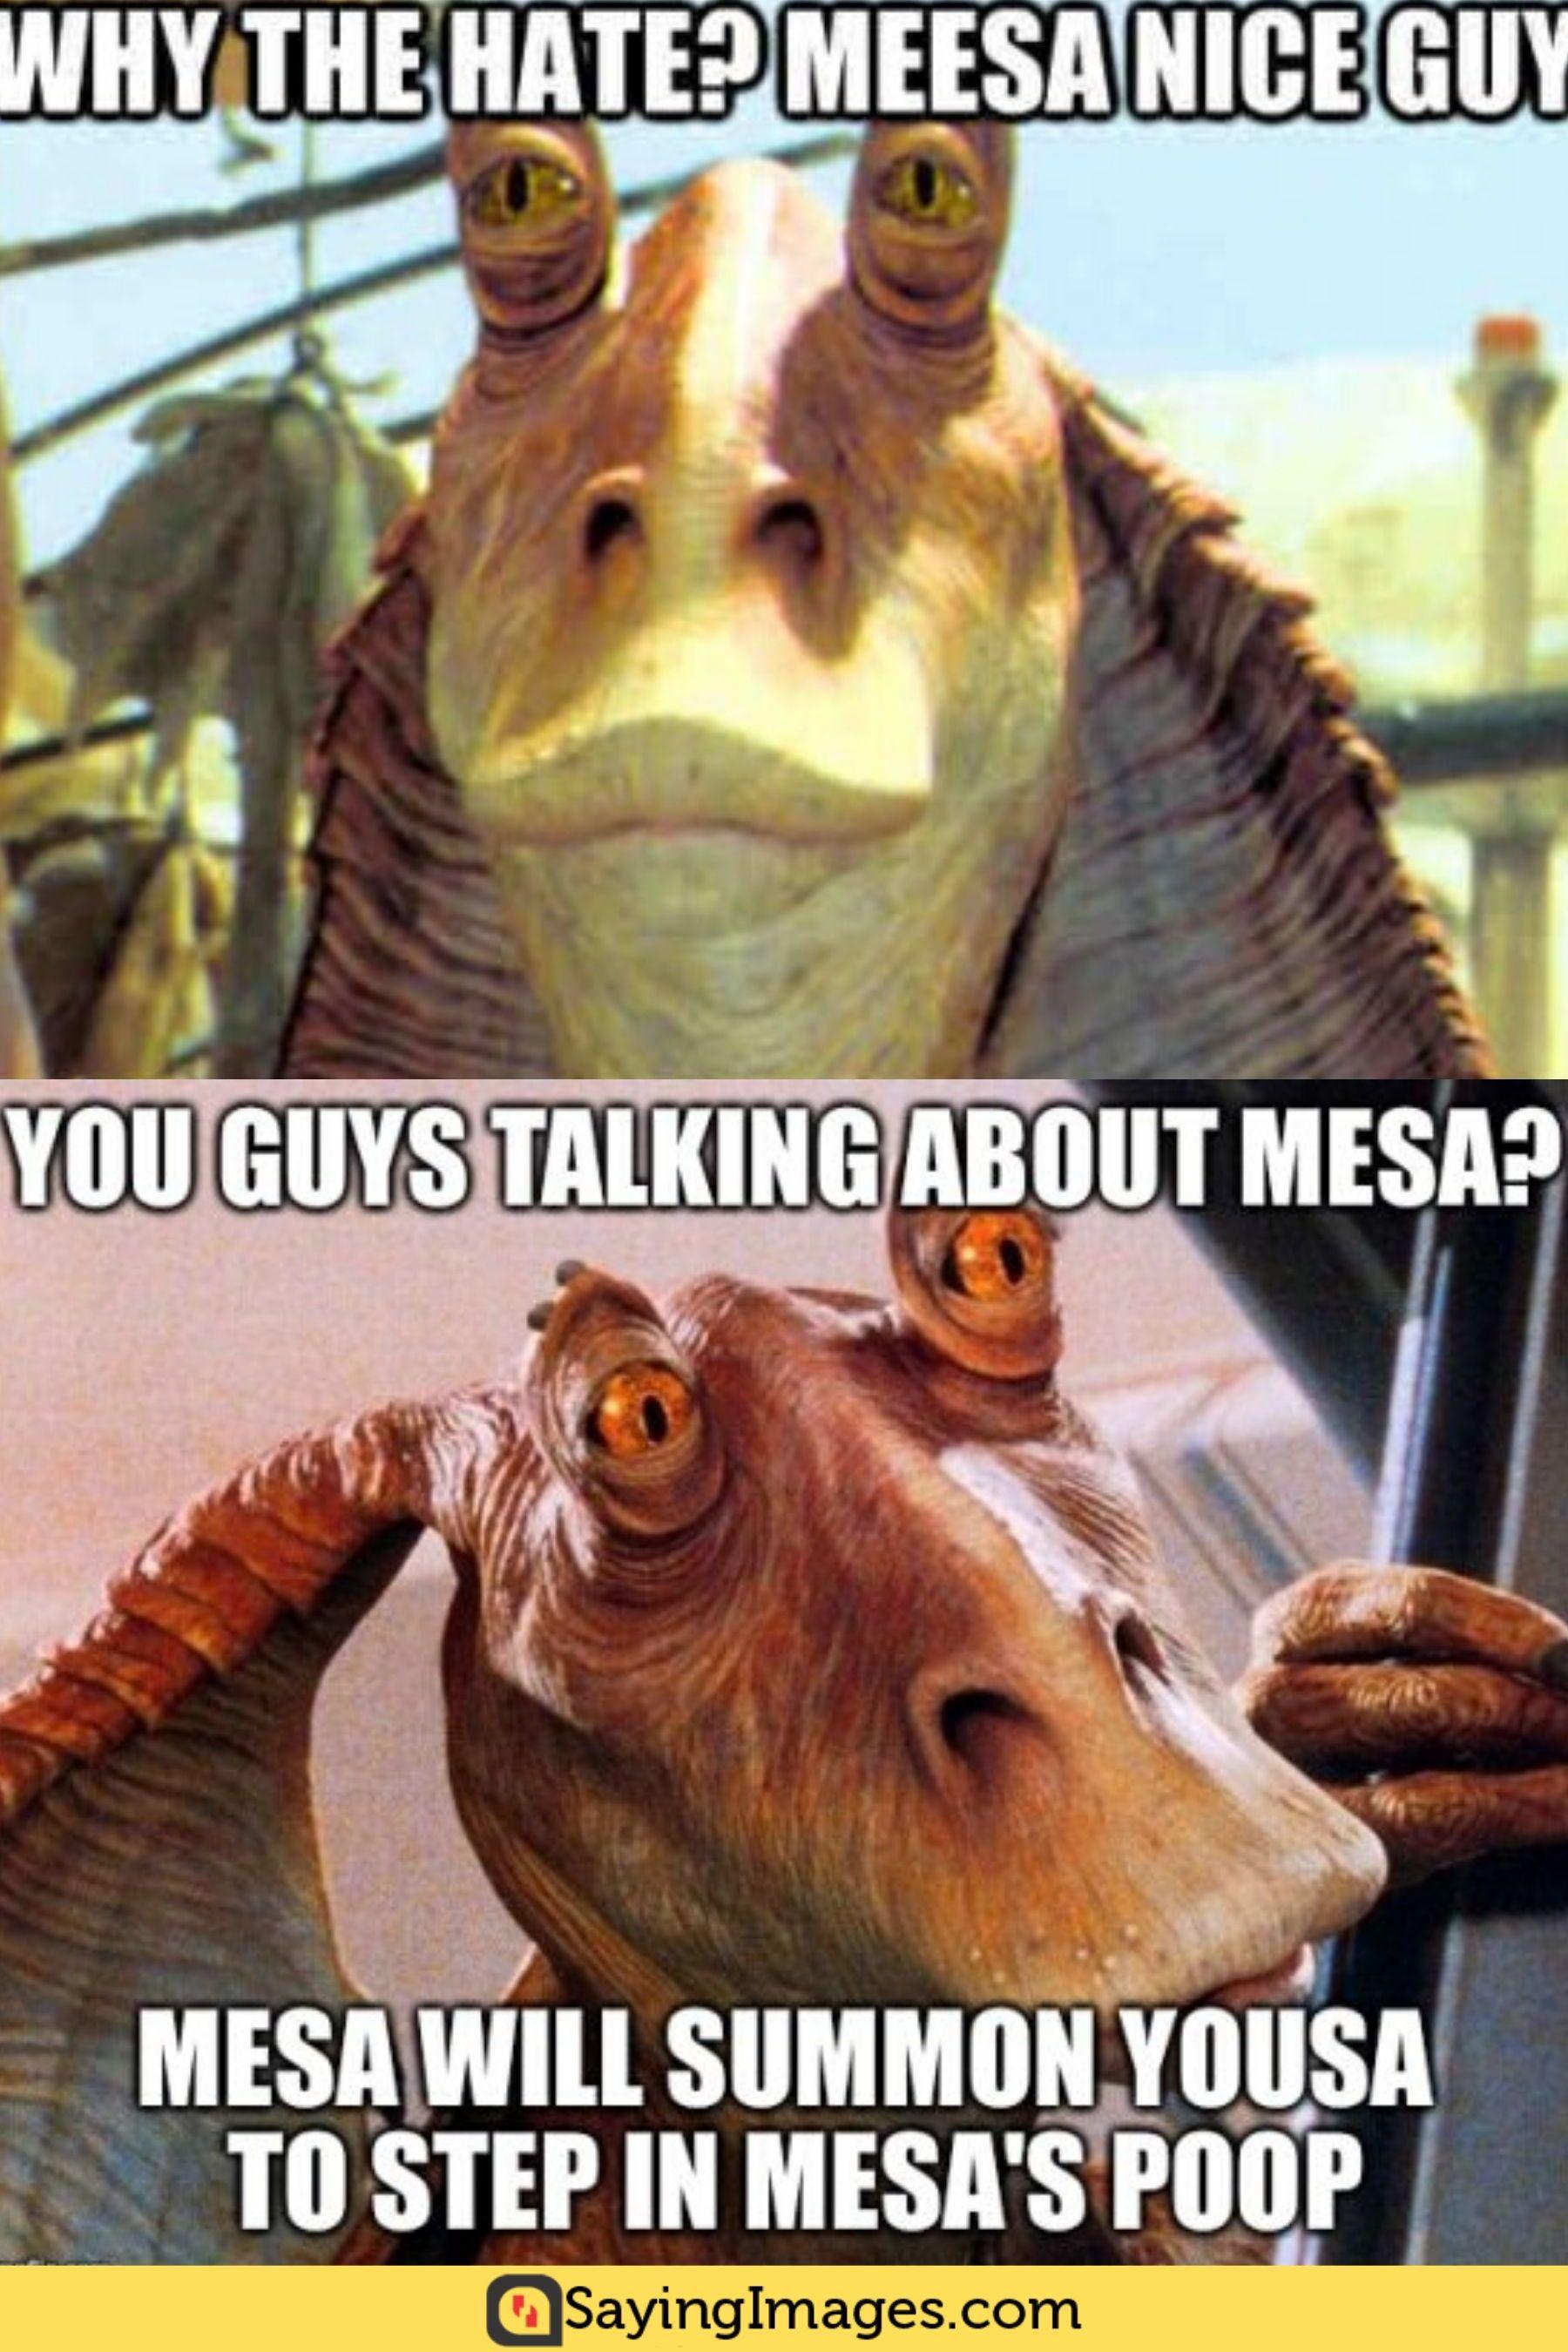 20 Jar Jar Binks Memes That Will Make You Love The Character Even More Sayingimages Com Memes Funny Memes Guy Talk